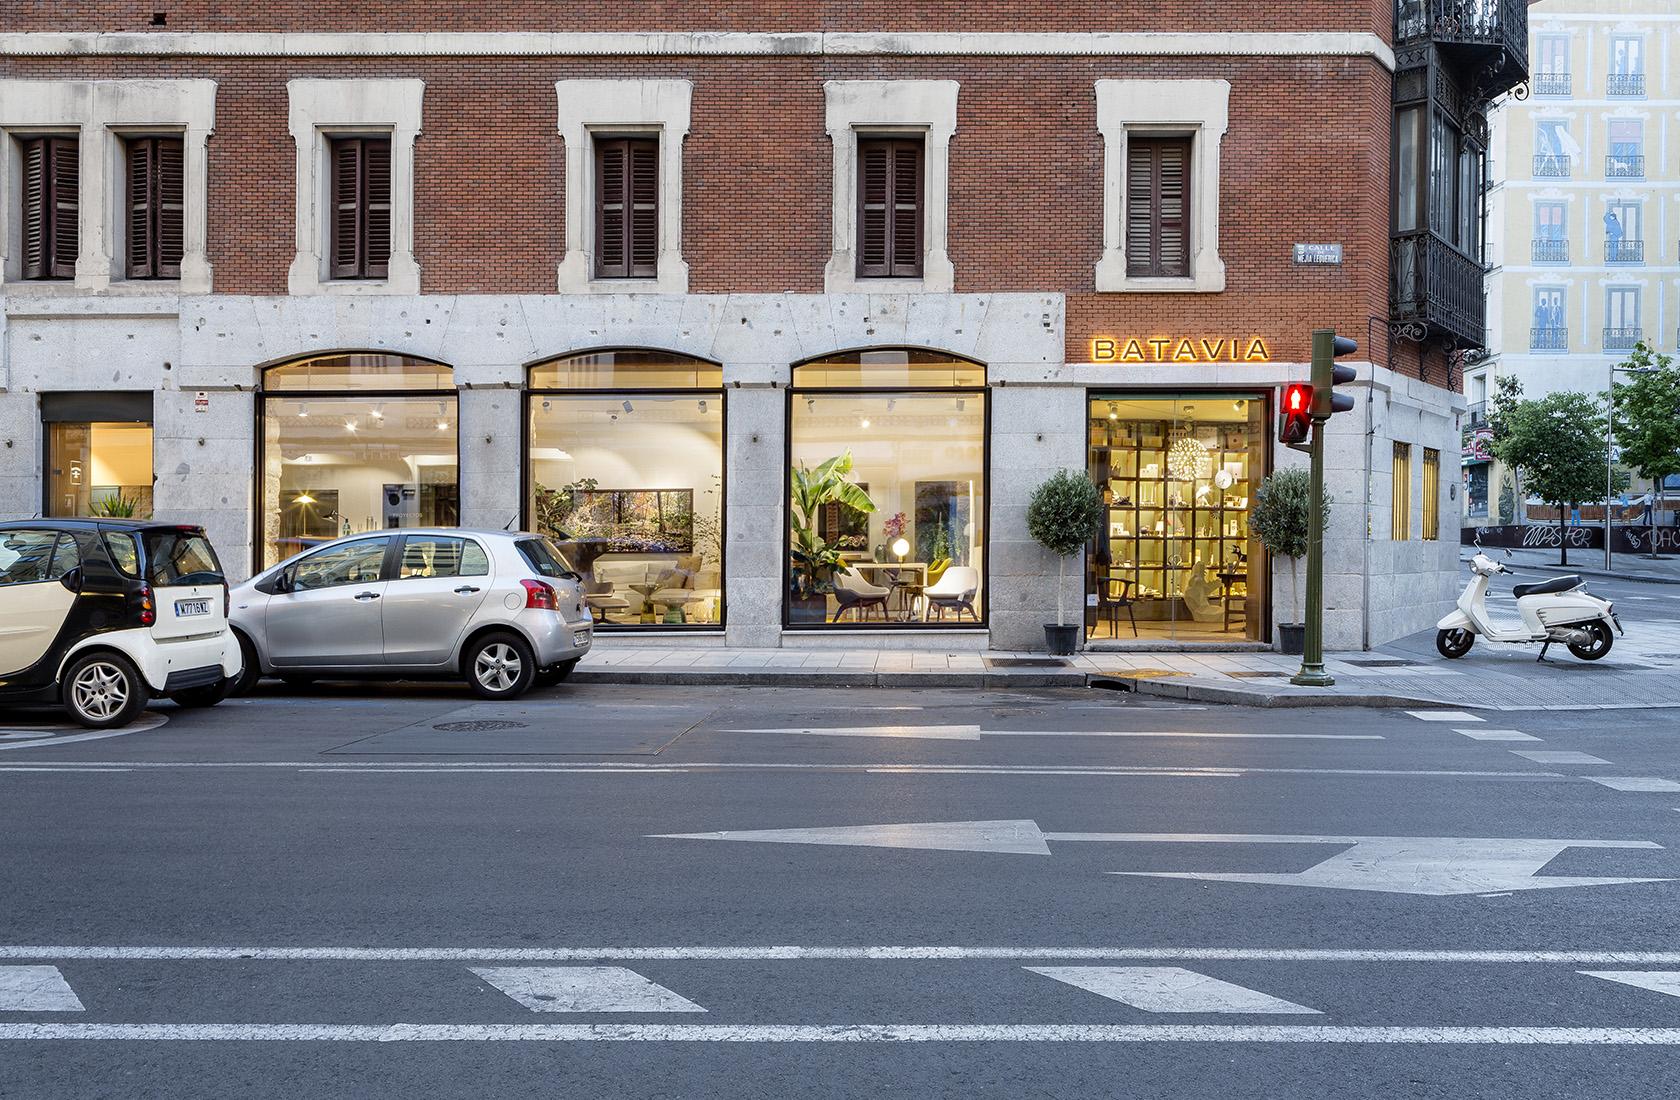 Exterior del showroom de BATAVIA situado en palacete rehabilitado de Madrid